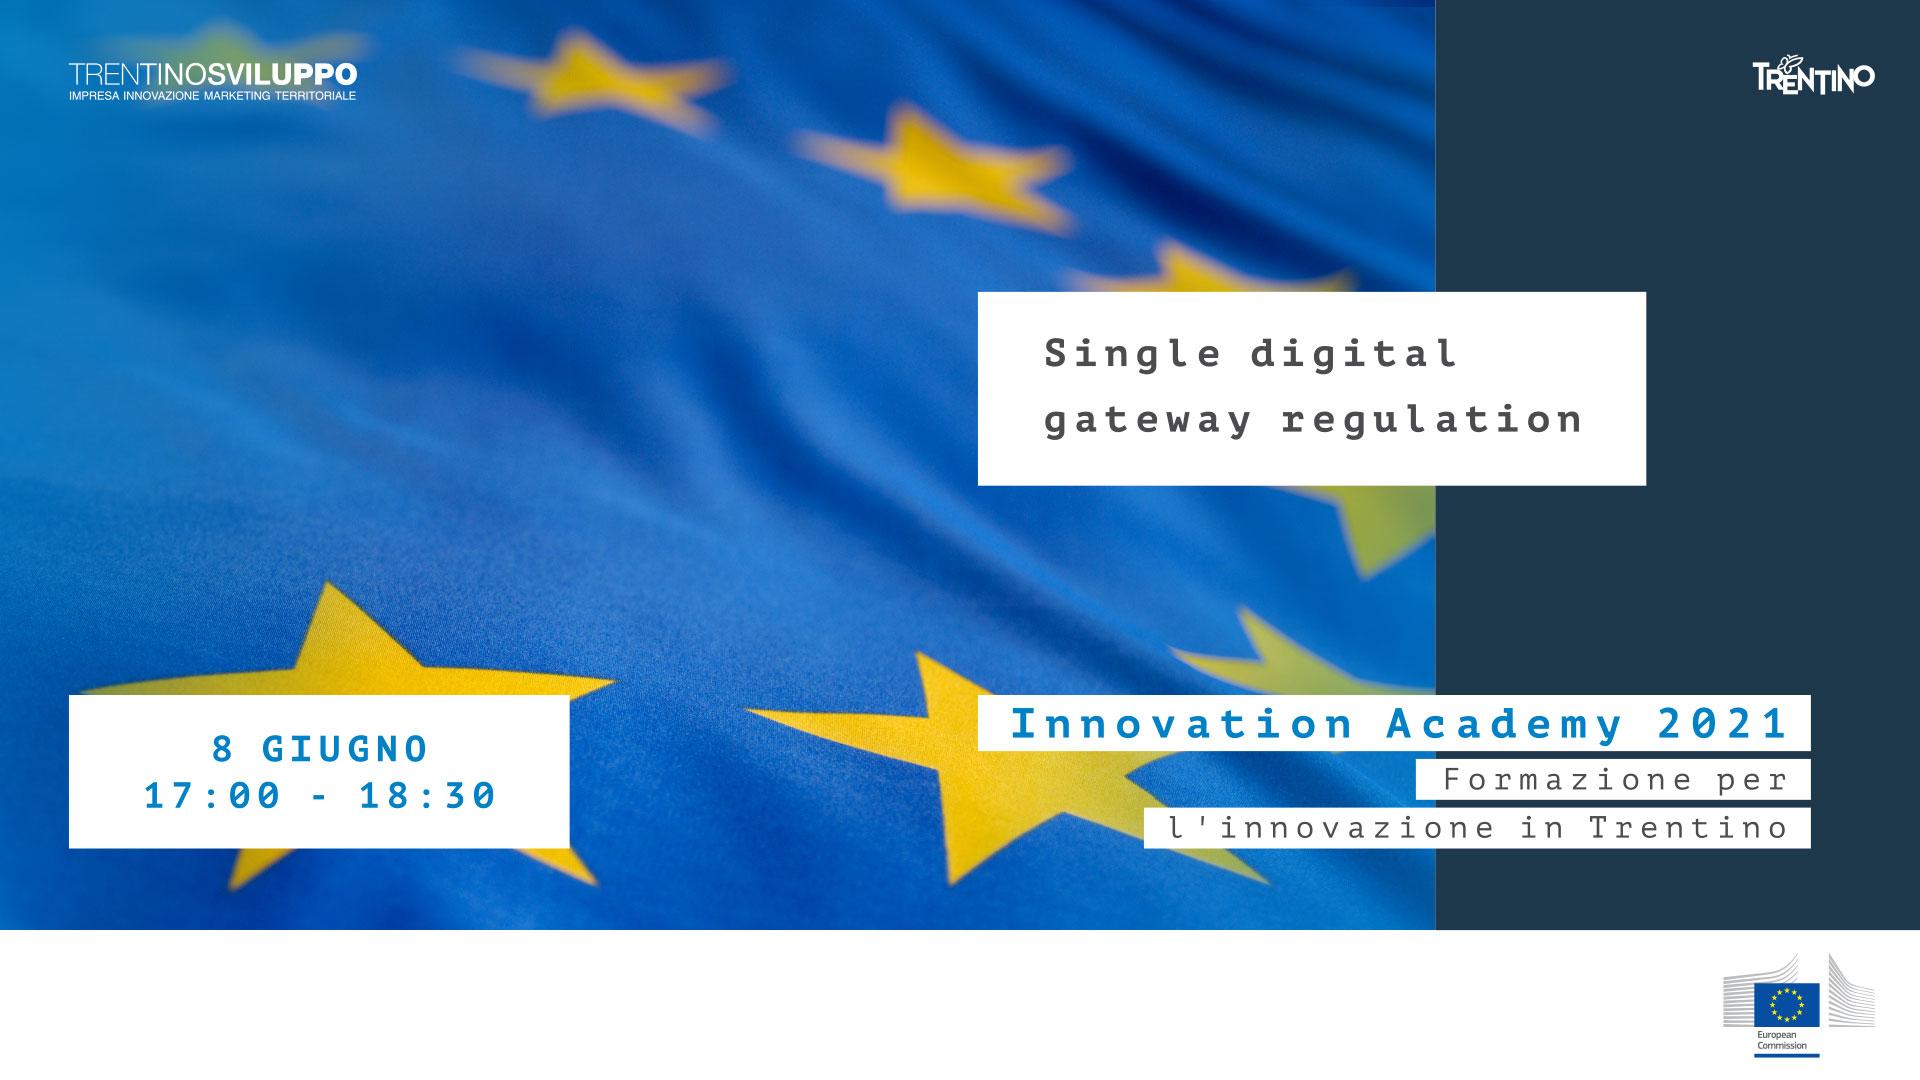 Innovation-Academy-Single-digital-gateway-regulation